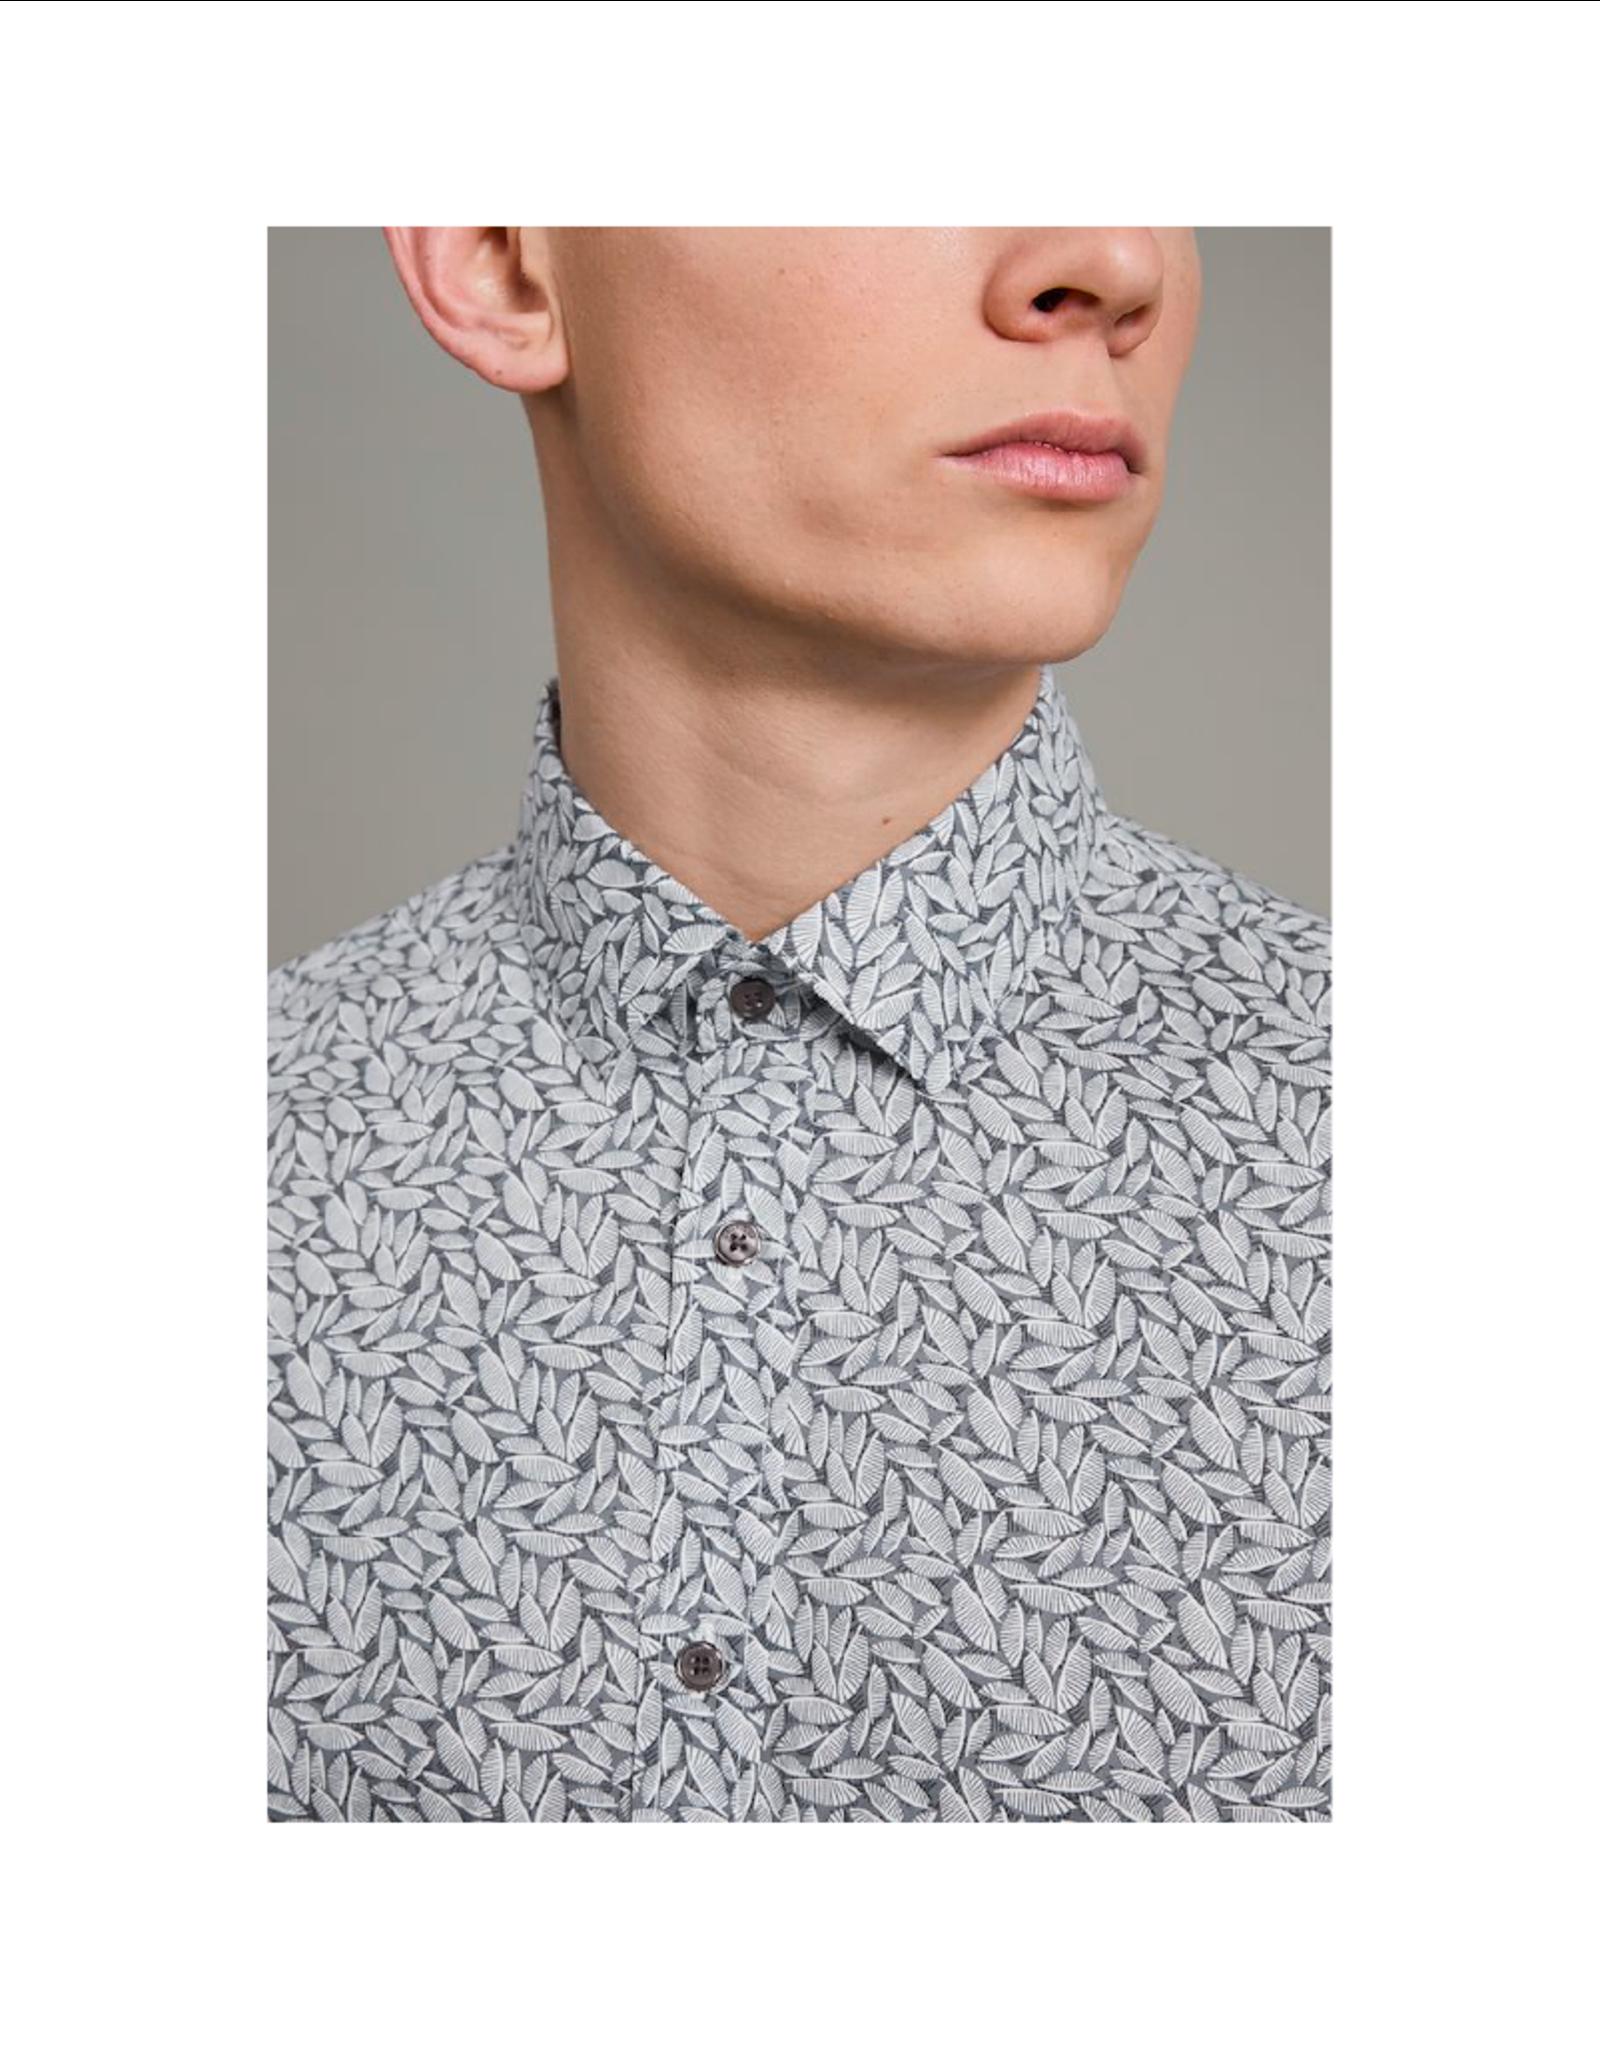 Matinique Trostol Short-Sleeve Button Up